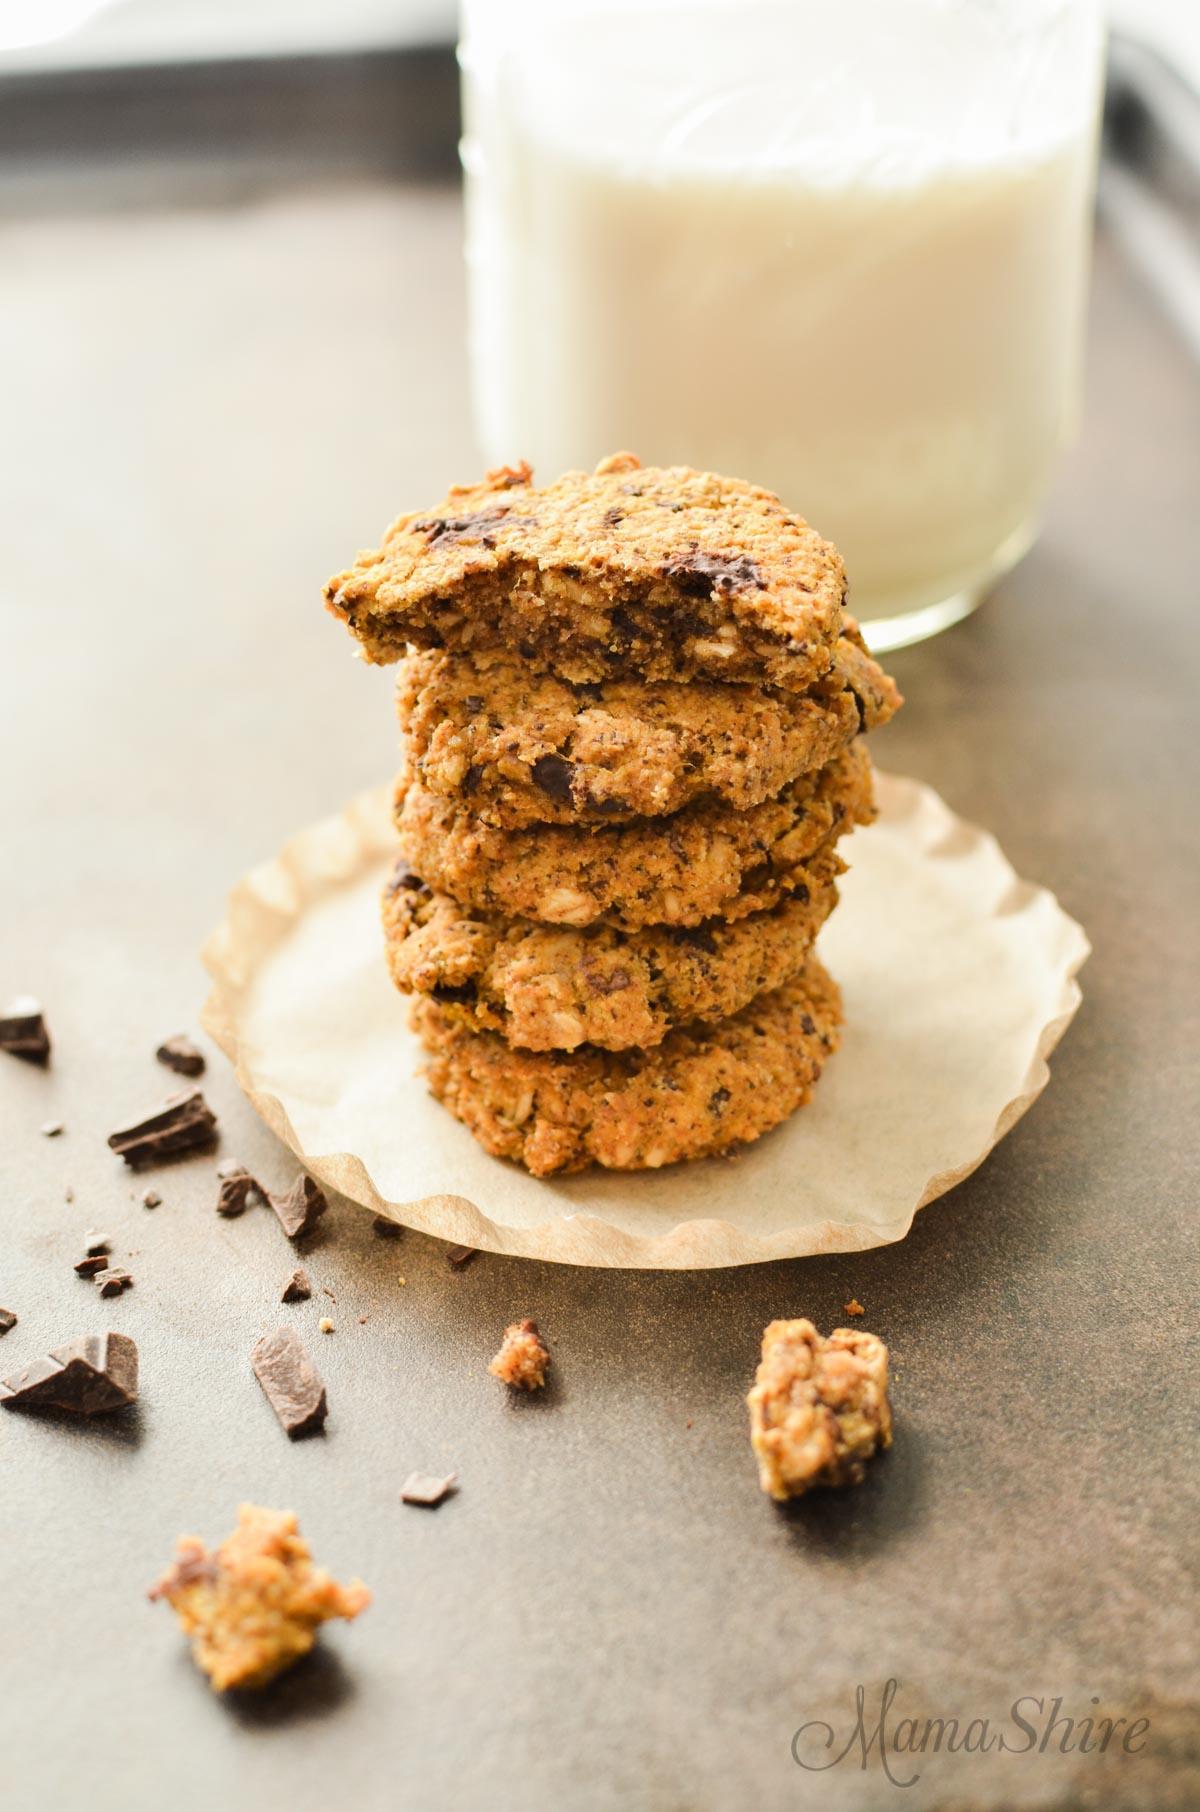 Pumpkin Oatmeal Chocolate Chunk Cookies - Gluten-Free - MamaShire.com